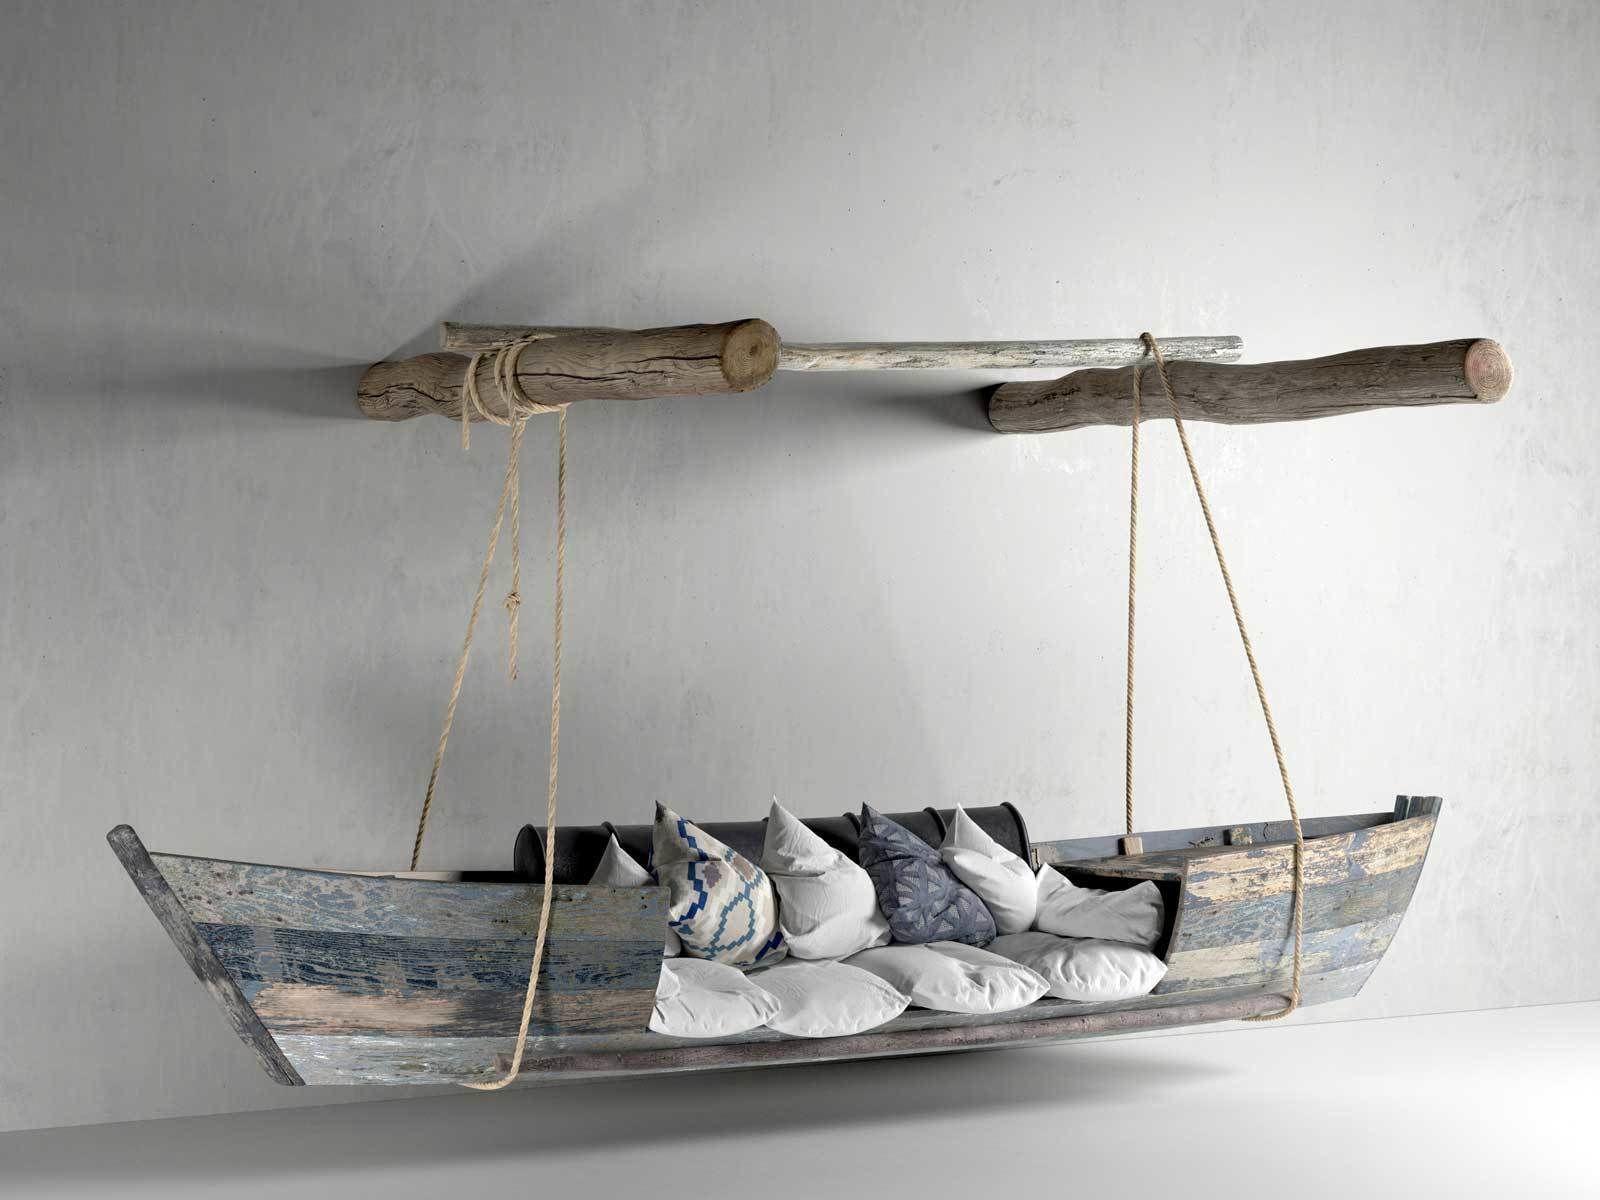 Hanging Boat Sofa   3D model in 2020   Boat furniture ...